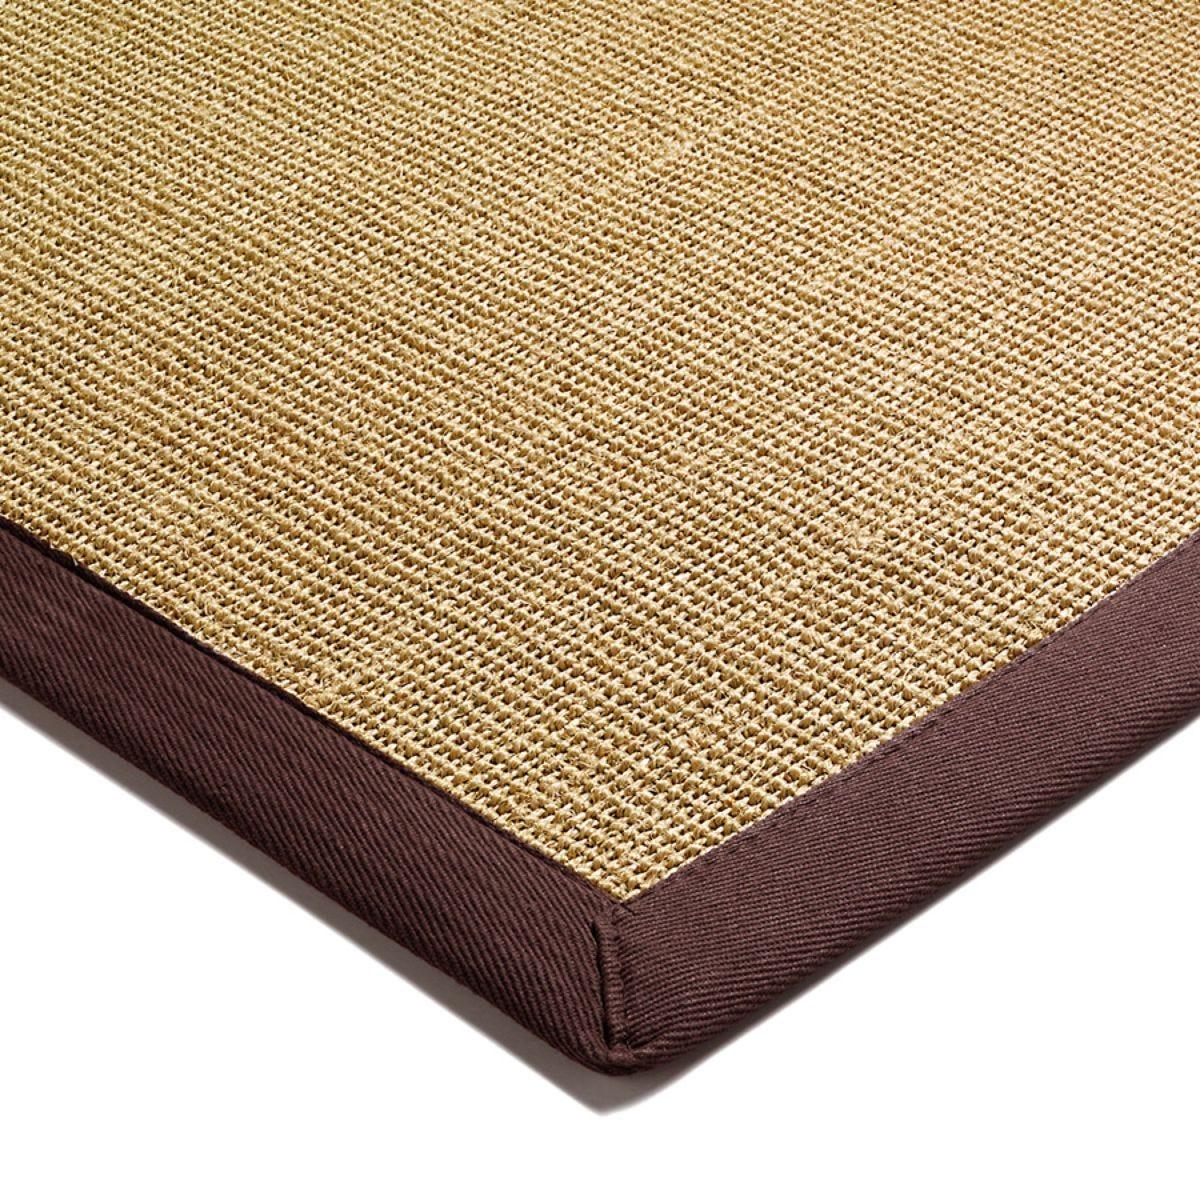 Asiatic Sisal Rug 230 x 160cm - Chocolate